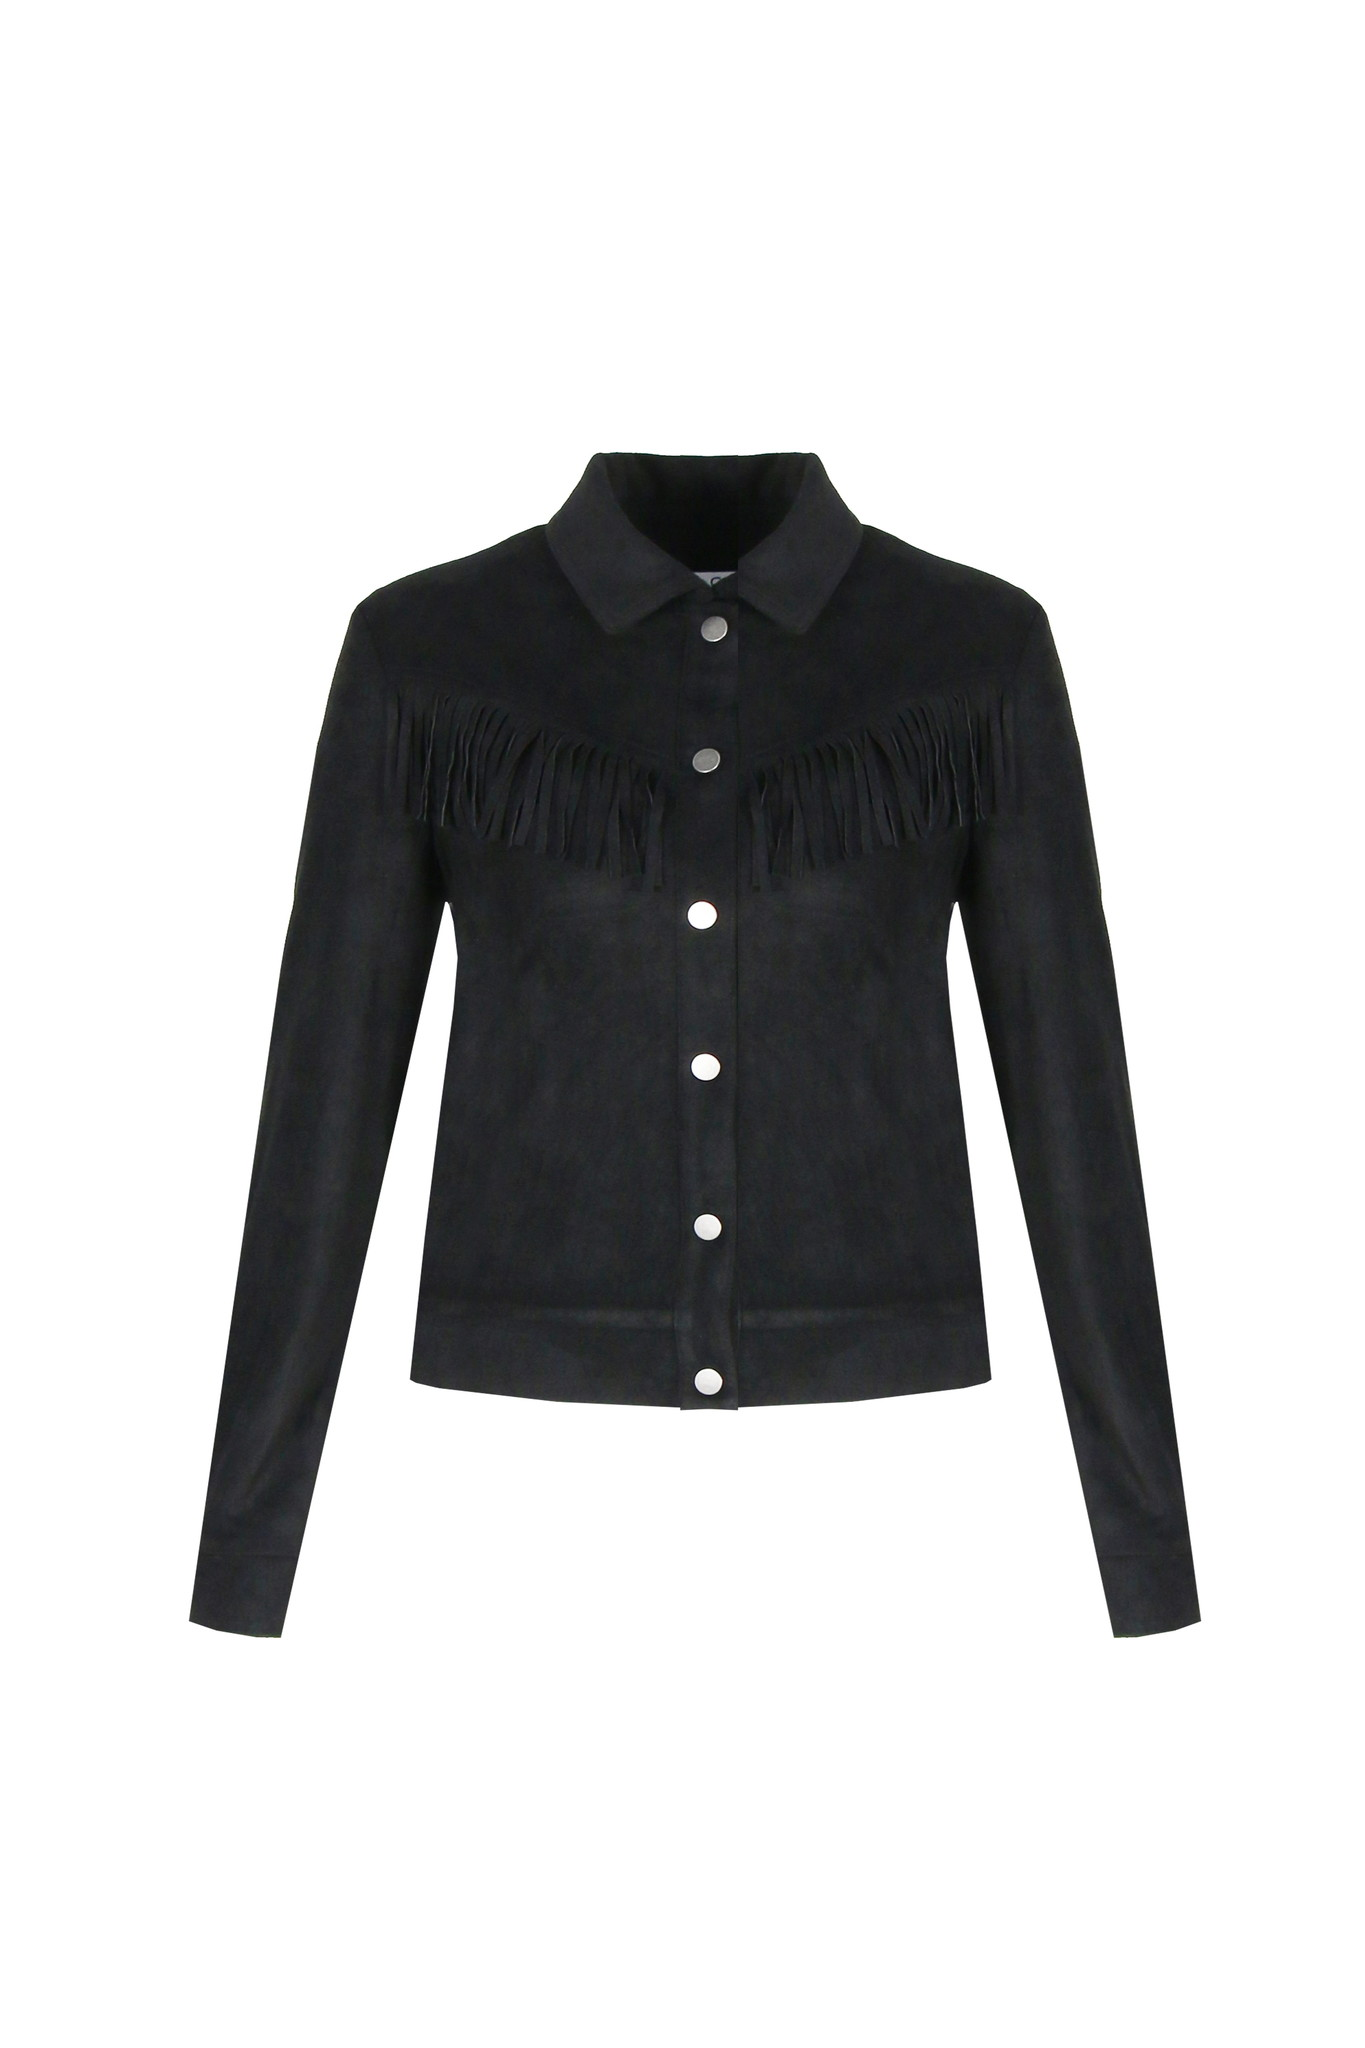 C&S The label C&S The label Merit jacket zwart